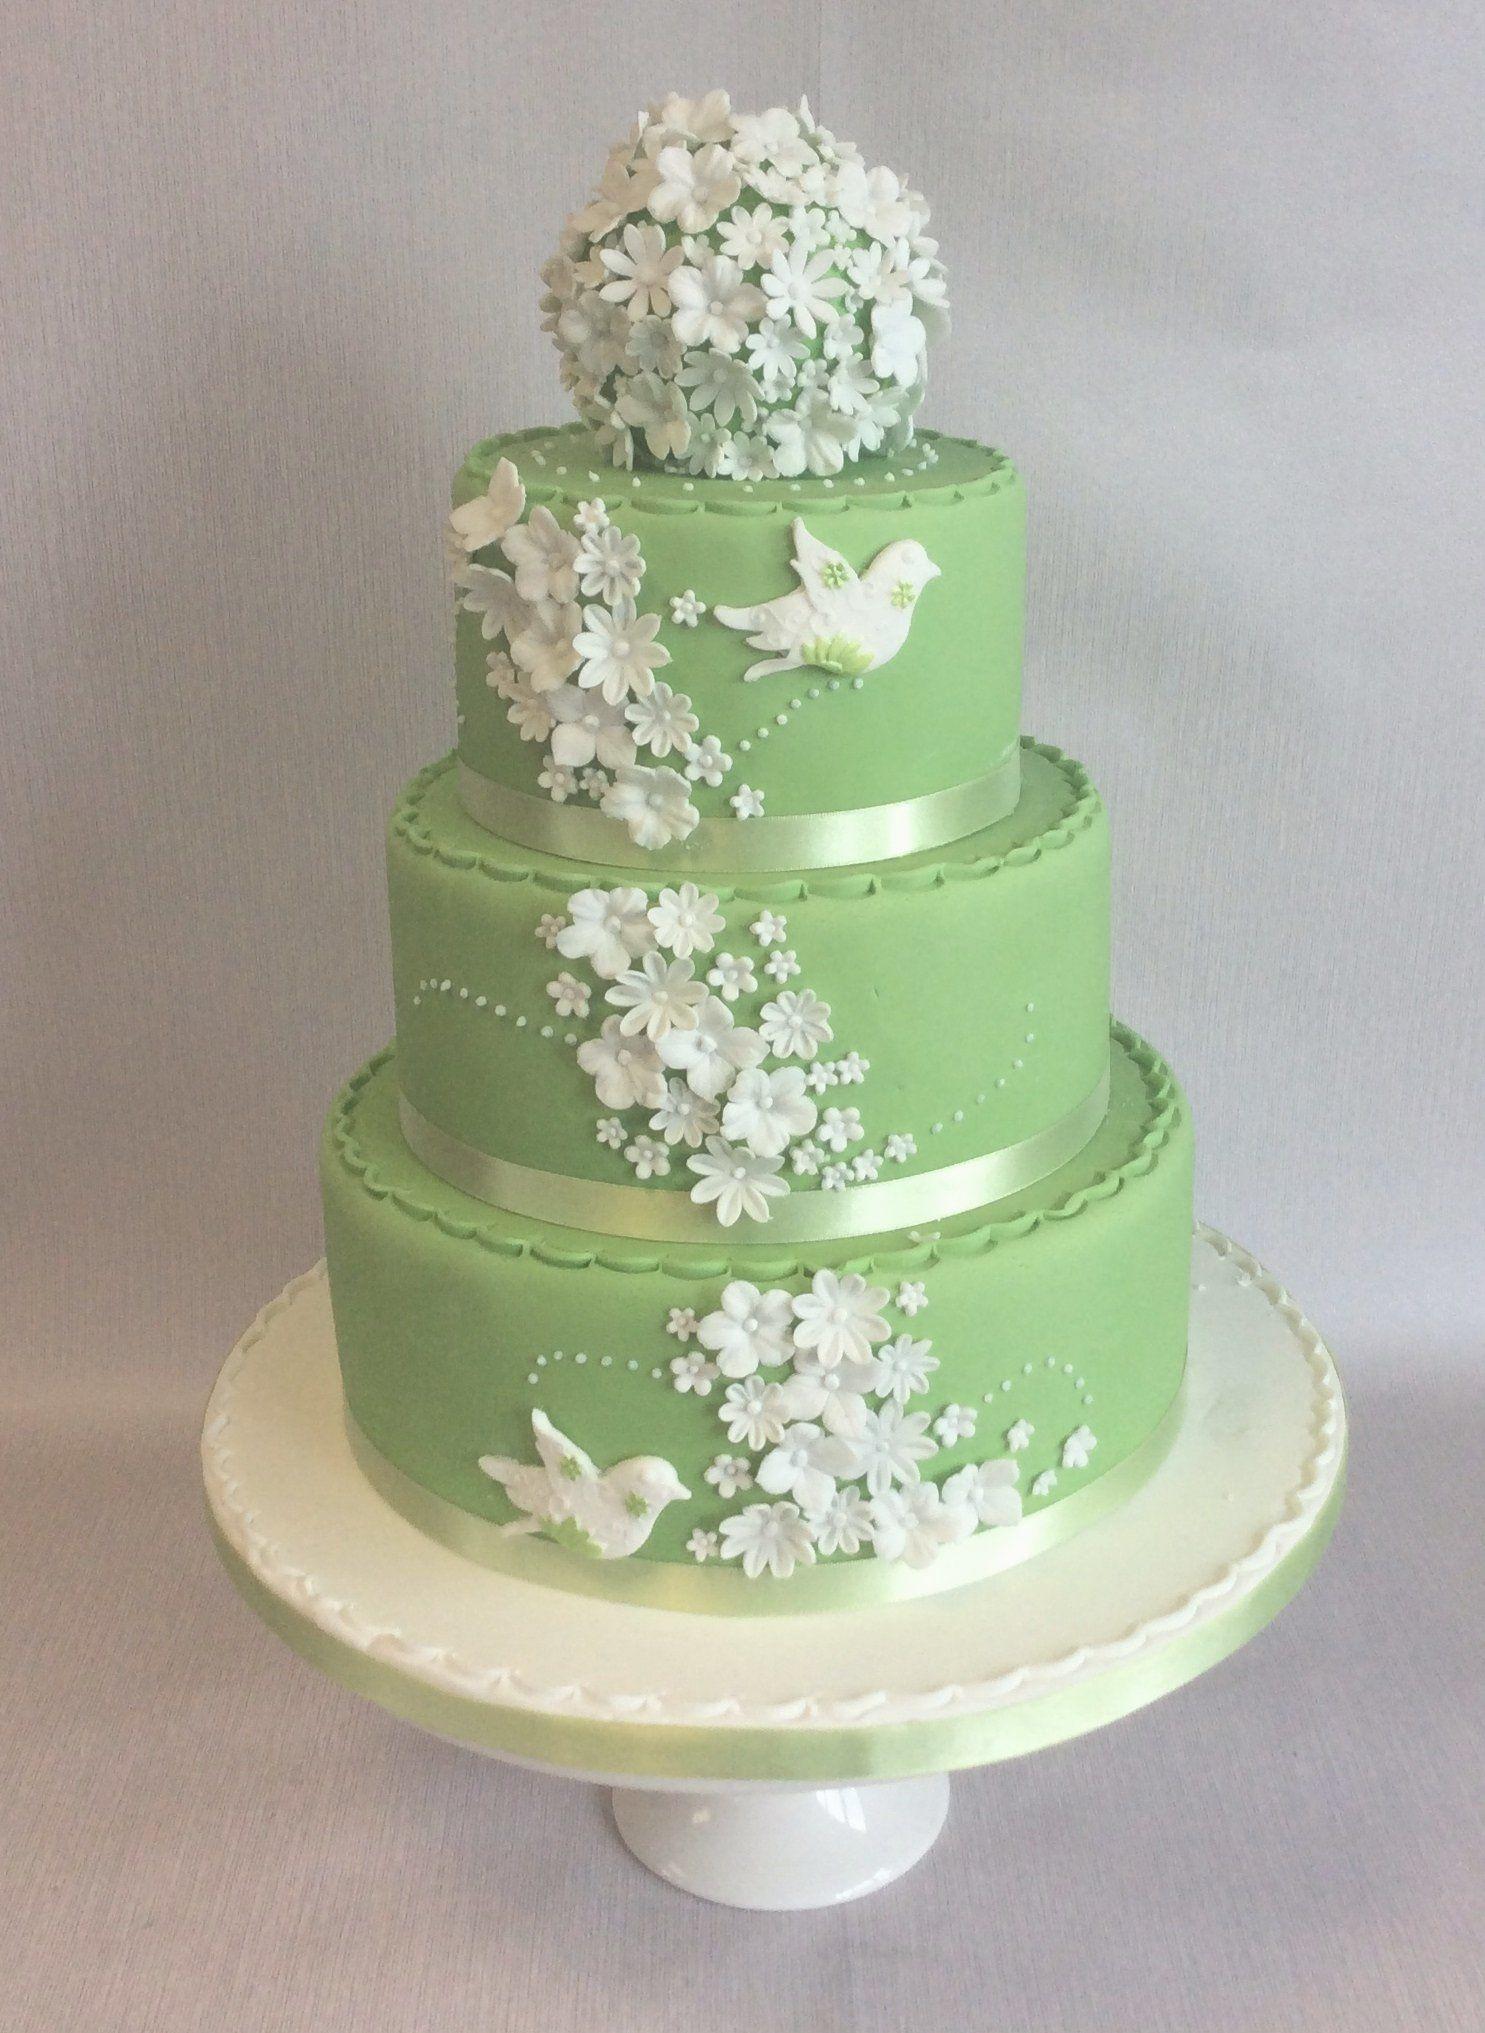 Amanda 3 tier spring green and white themed wedding cake